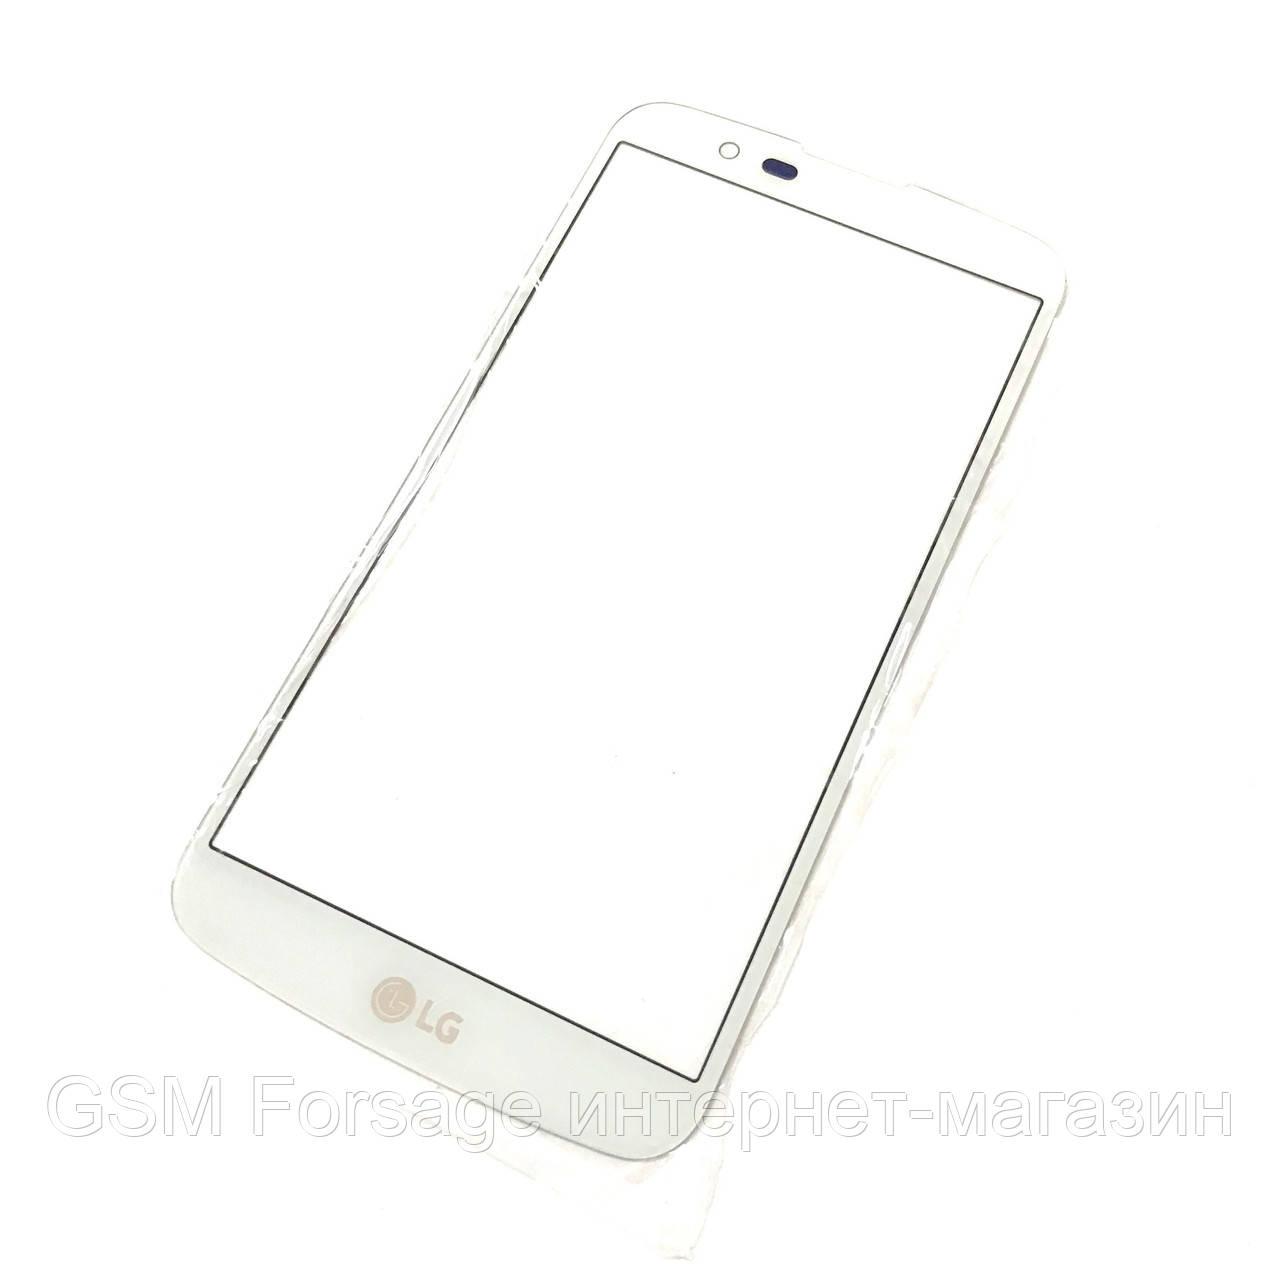 Стекло дисплея LG K10 K410 / K10 K420N / K10 K430DS / K10 K430DSF White (для переклейки)